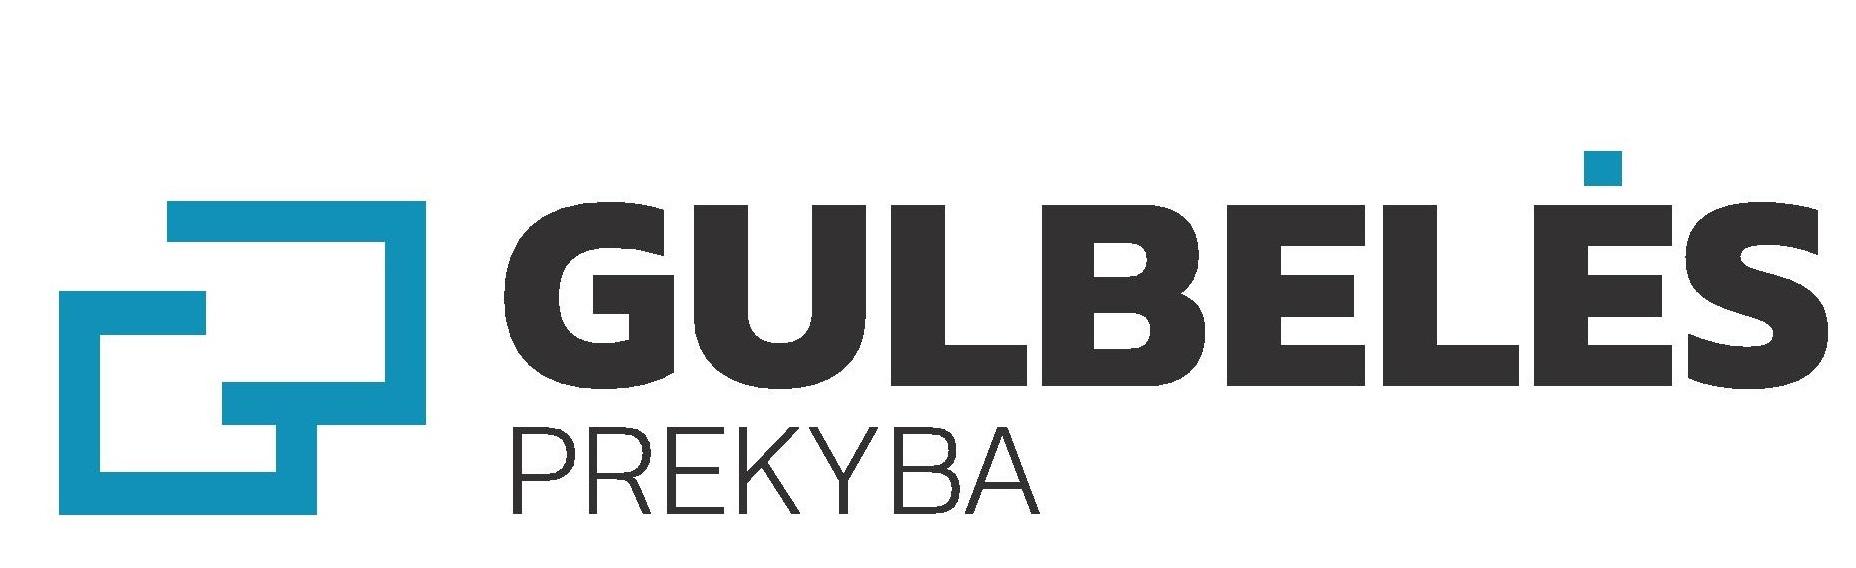 Gulbeles Prekyba-new logo